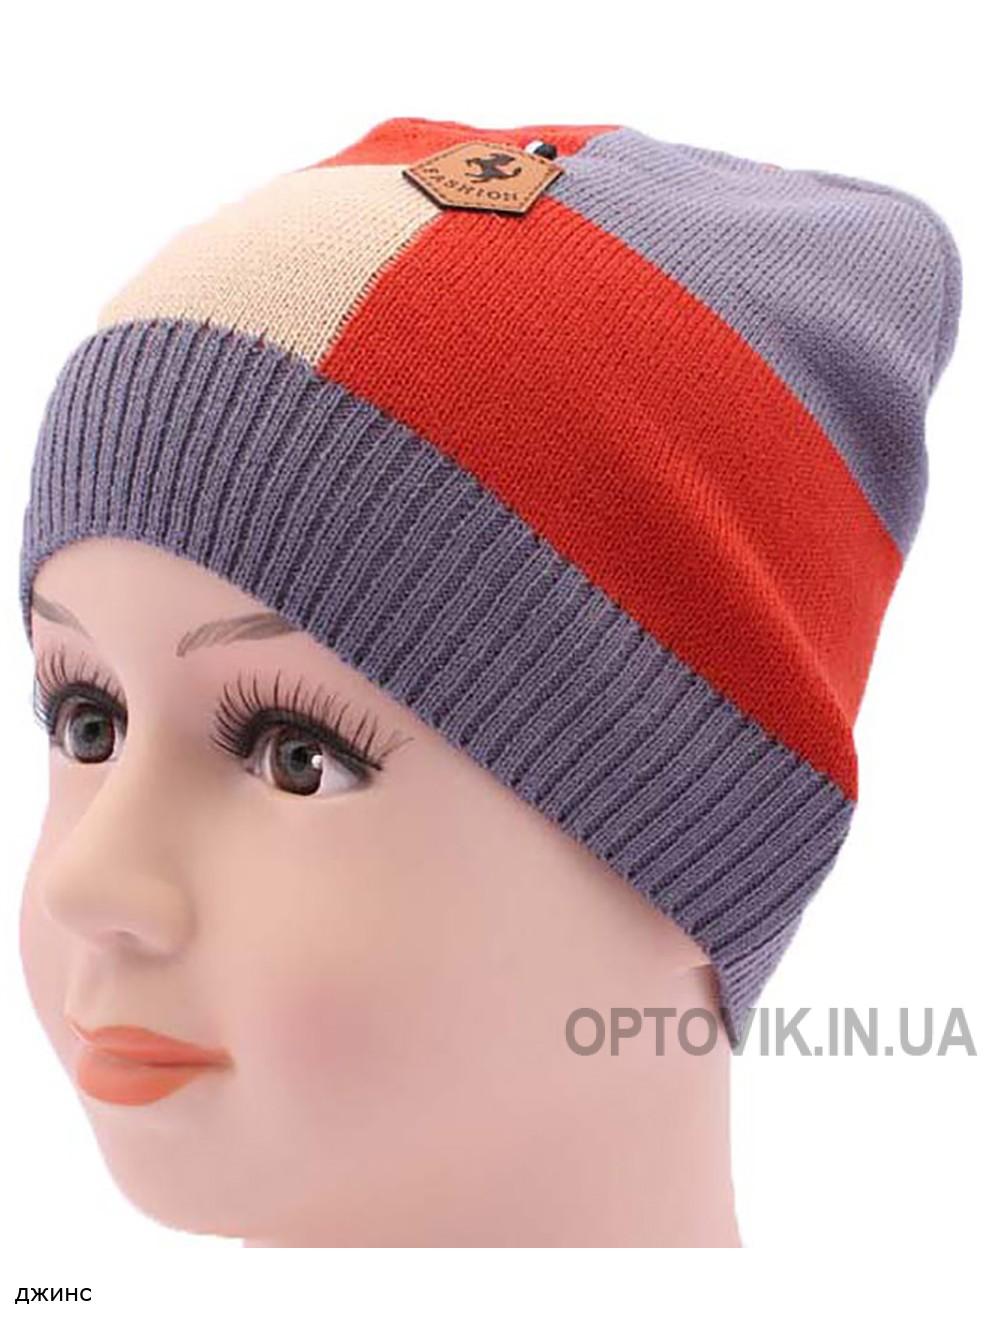 Детская вязаная шапка Квадратик DV1818-46-50